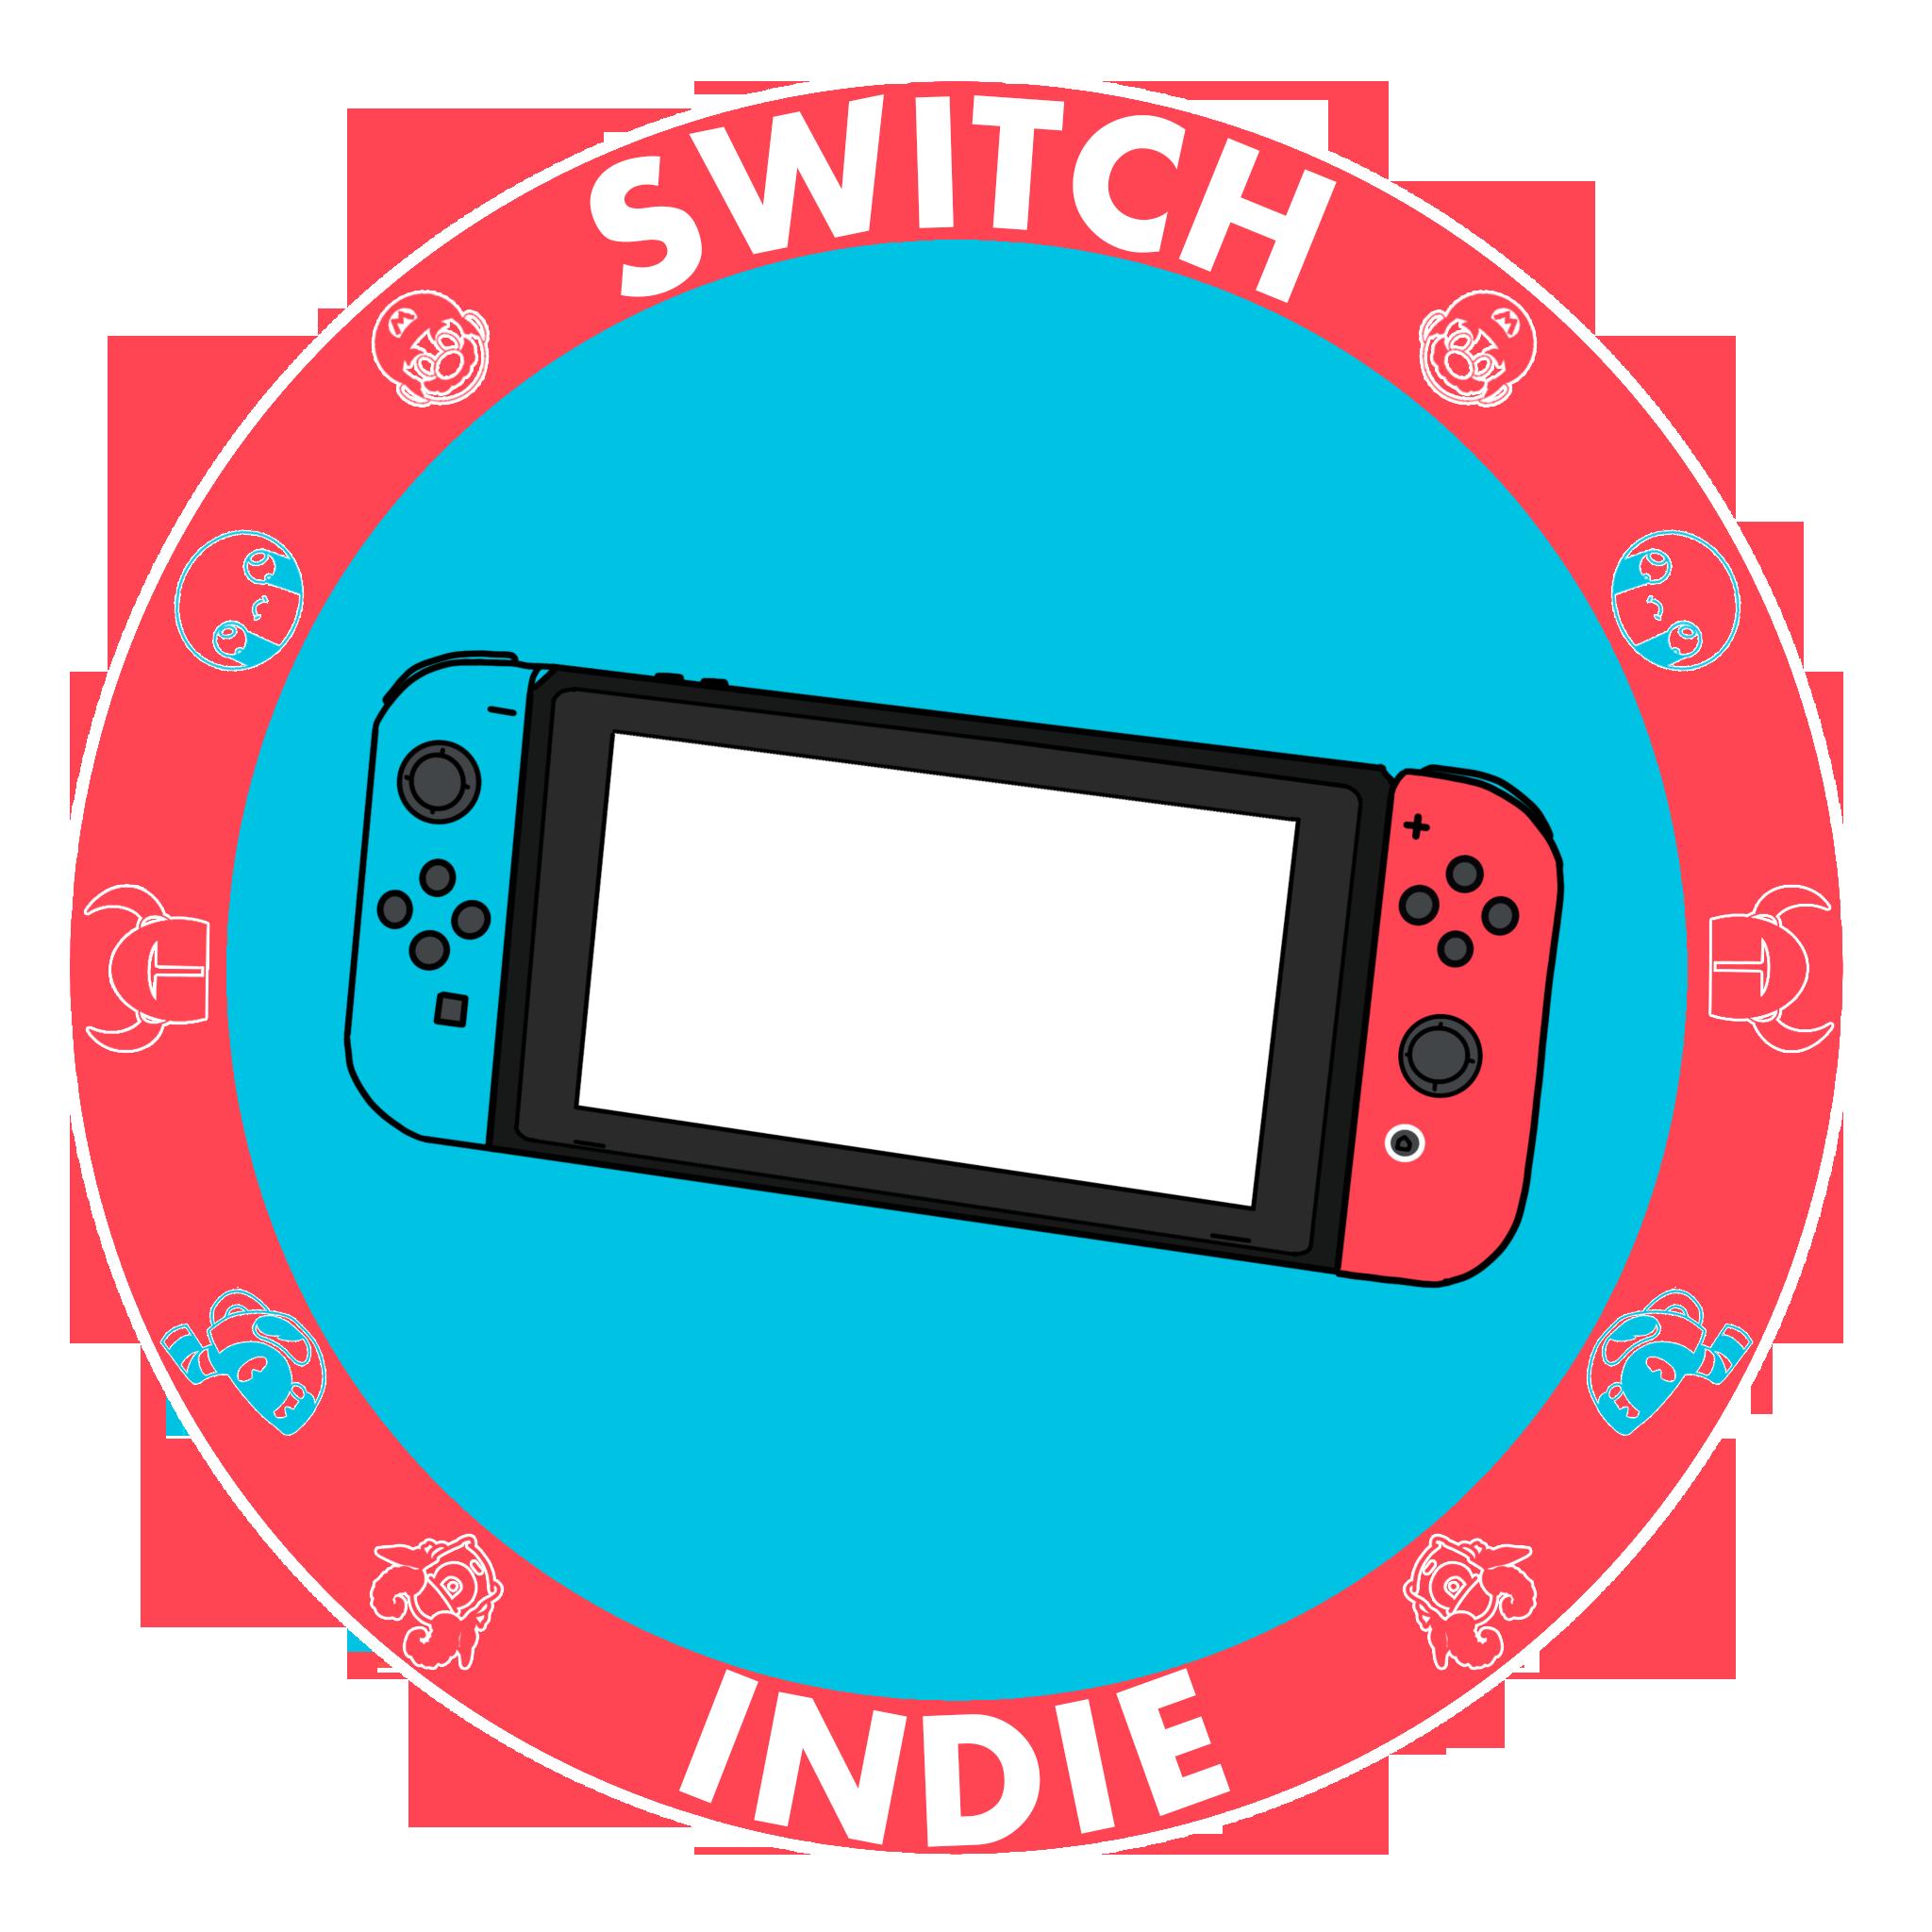 SwitchIndie